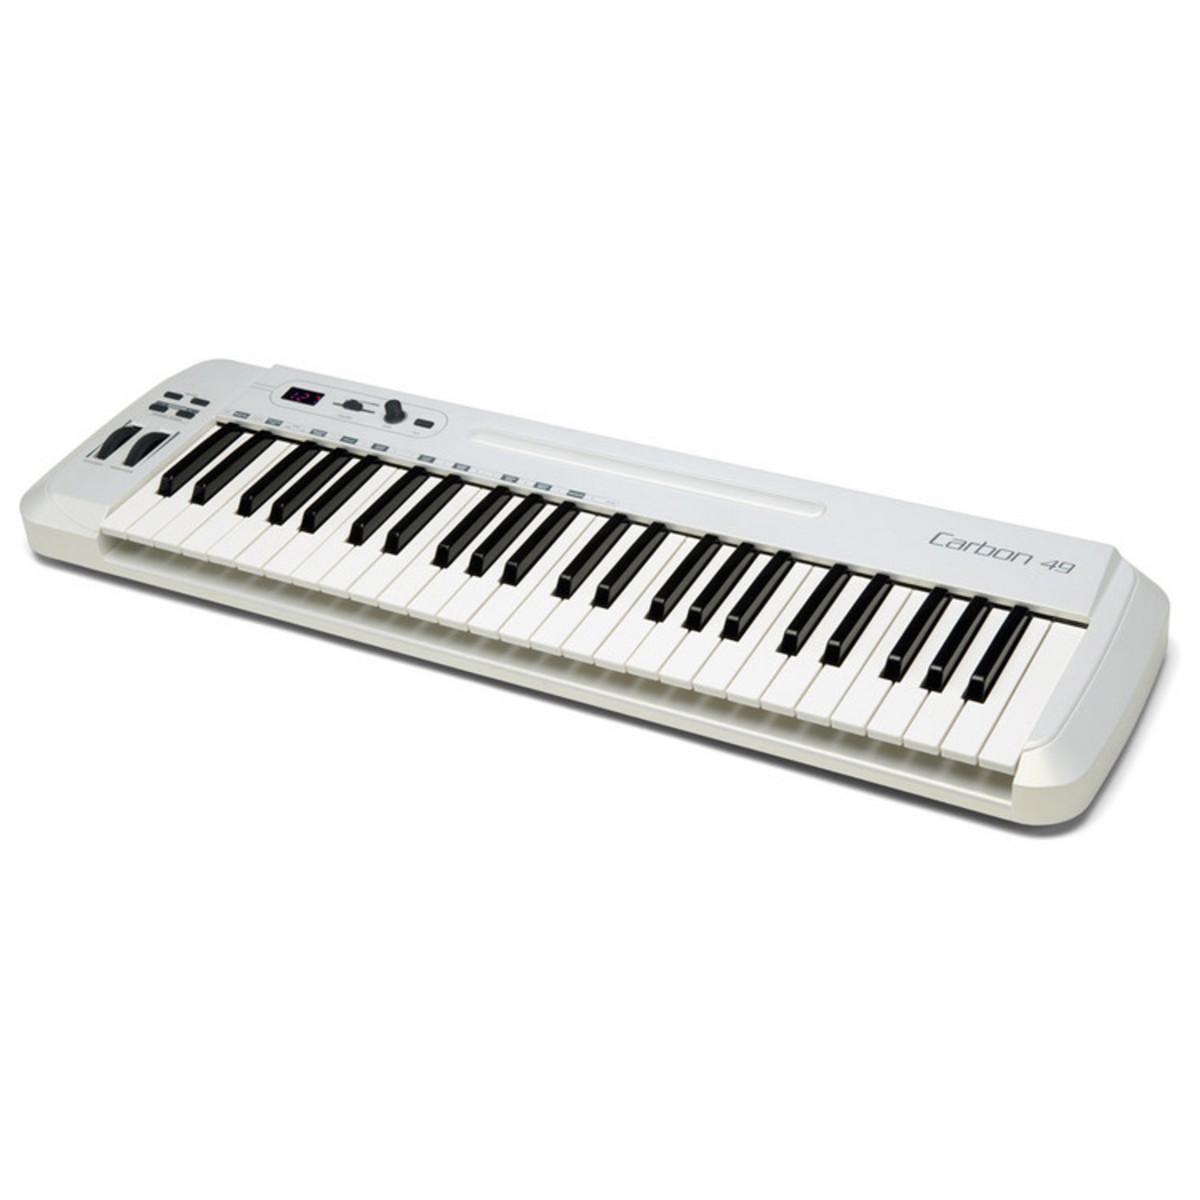 samson carbon 49 usb midi keyboard controller nearly new. Black Bedroom Furniture Sets. Home Design Ideas